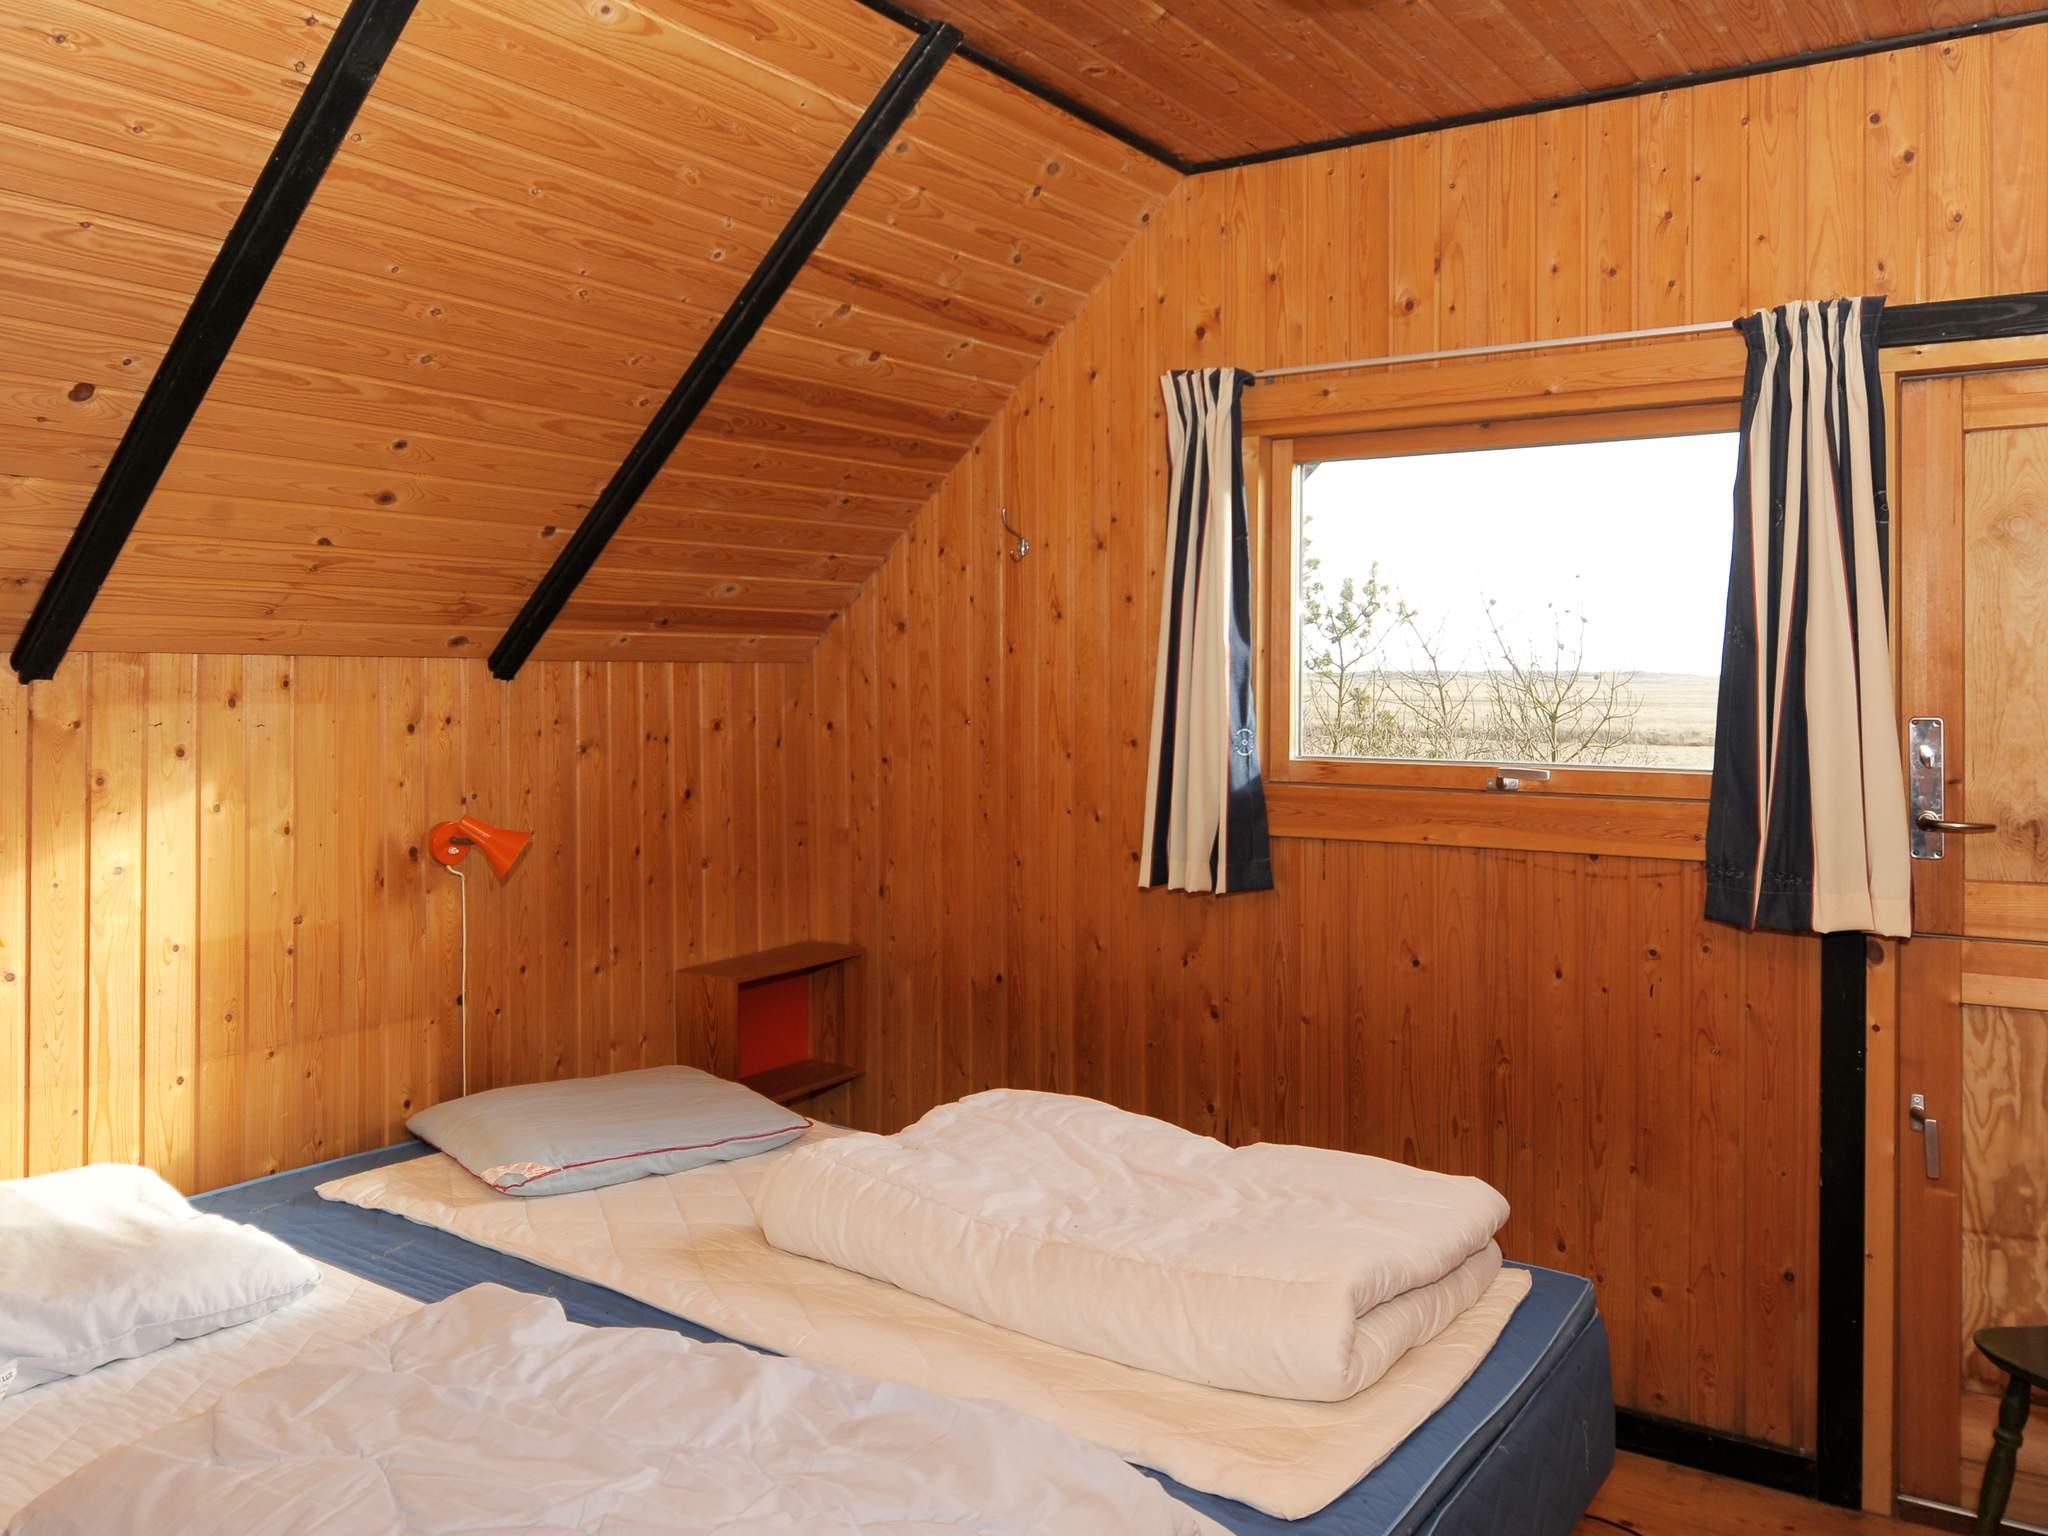 Ferienhaus Blåvand (82266), Blåvand, , Westjütland, Dänemark, Bild 11